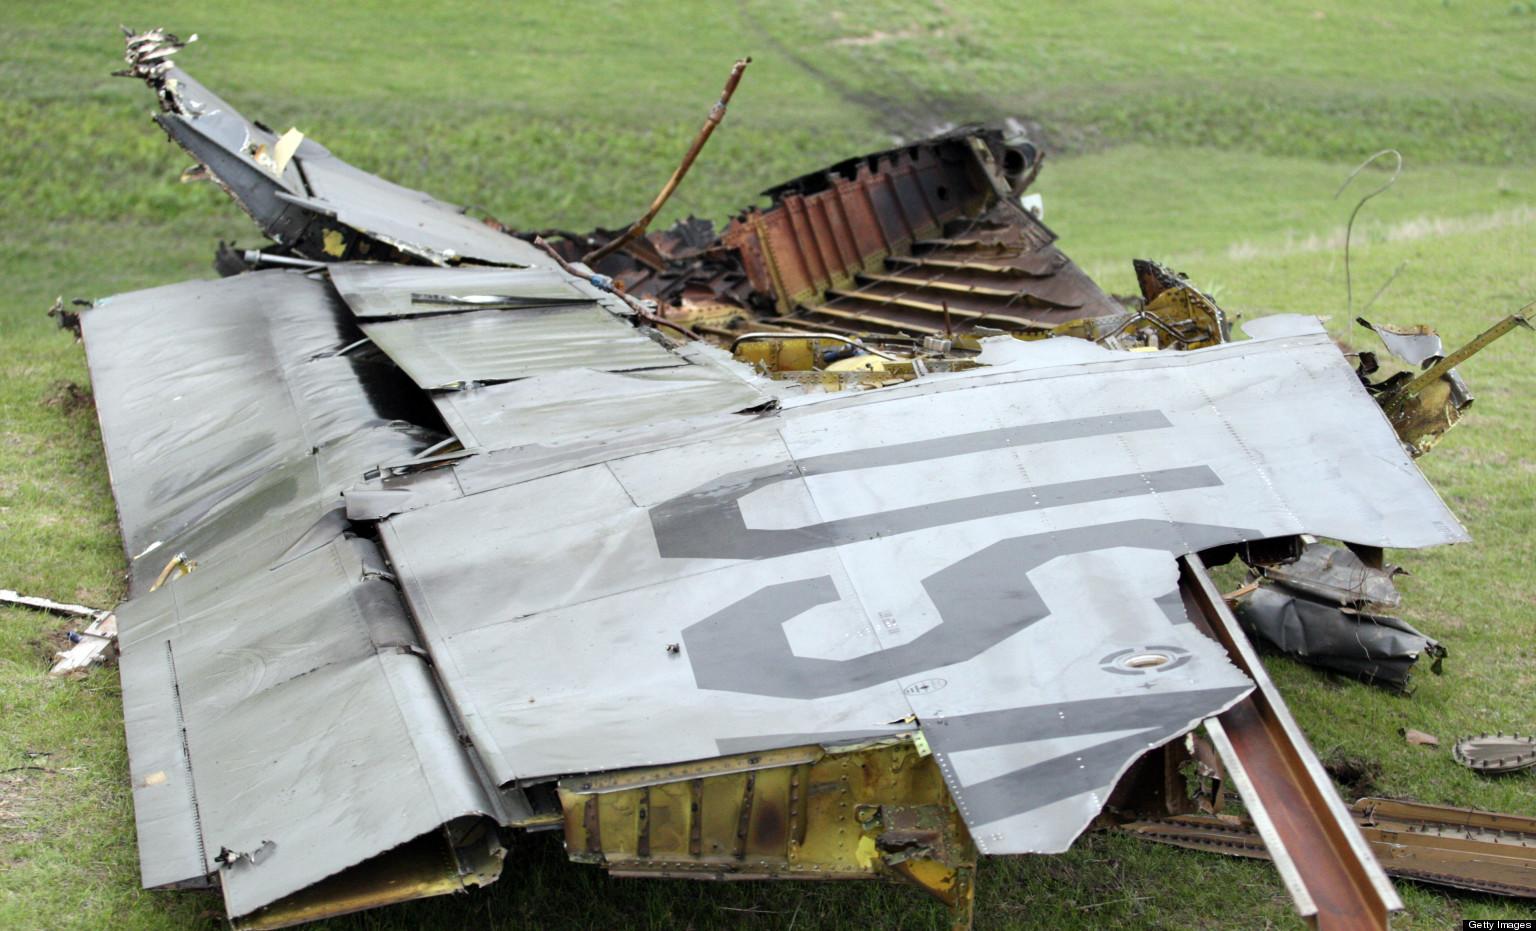 Plane Crash Bodies Photos Plane crash wreckage